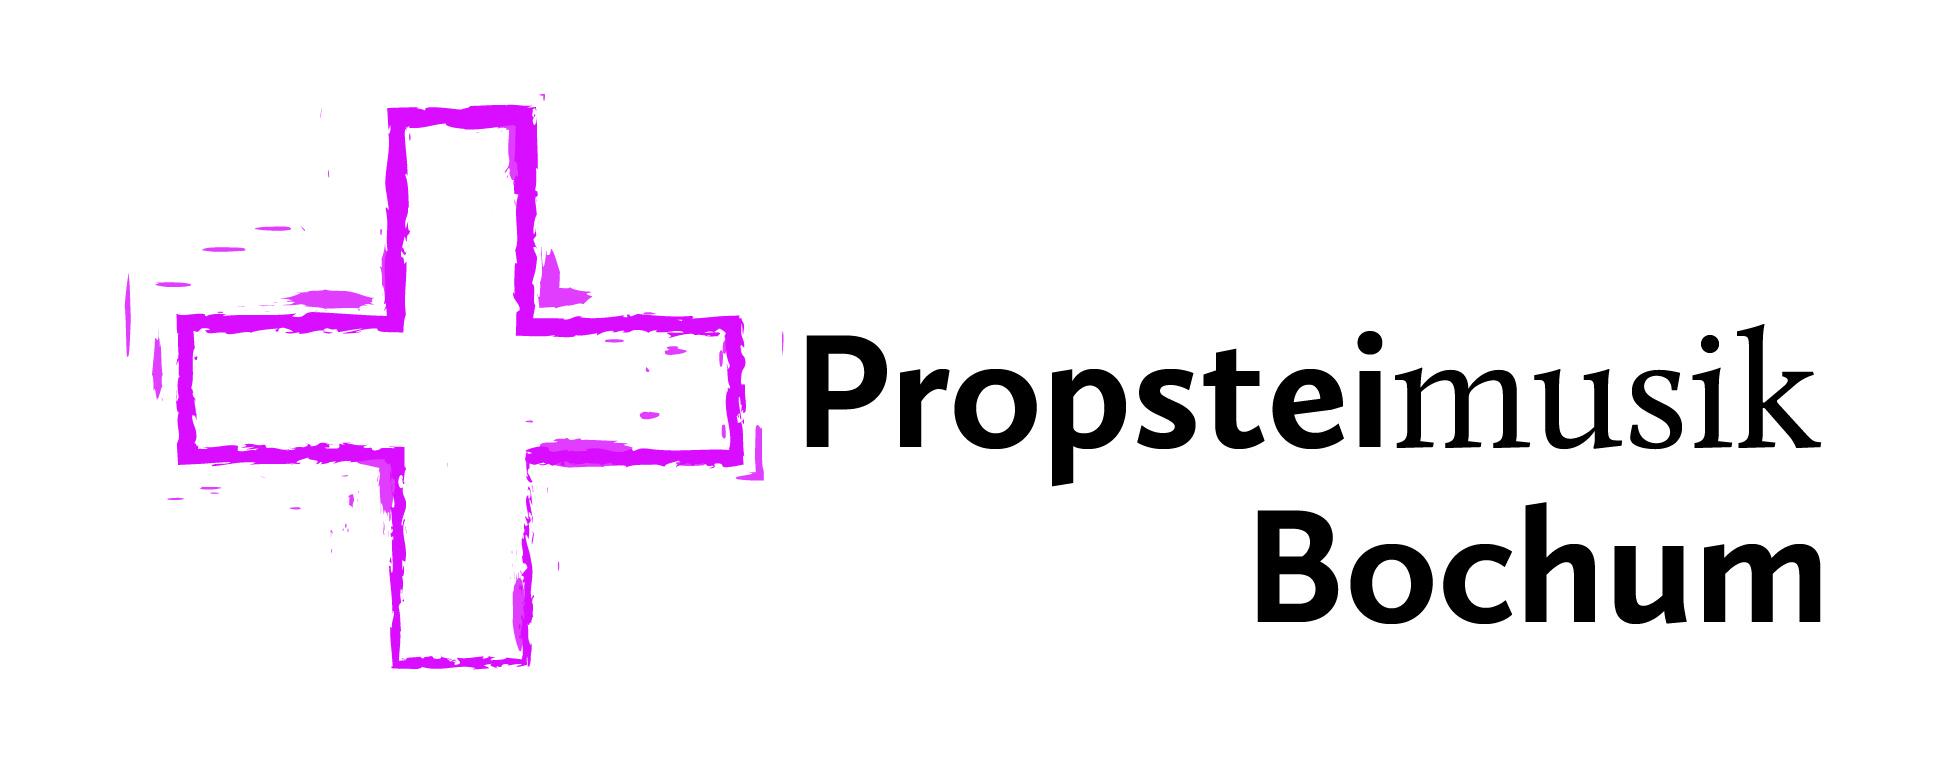 Propsteimusik Bochum